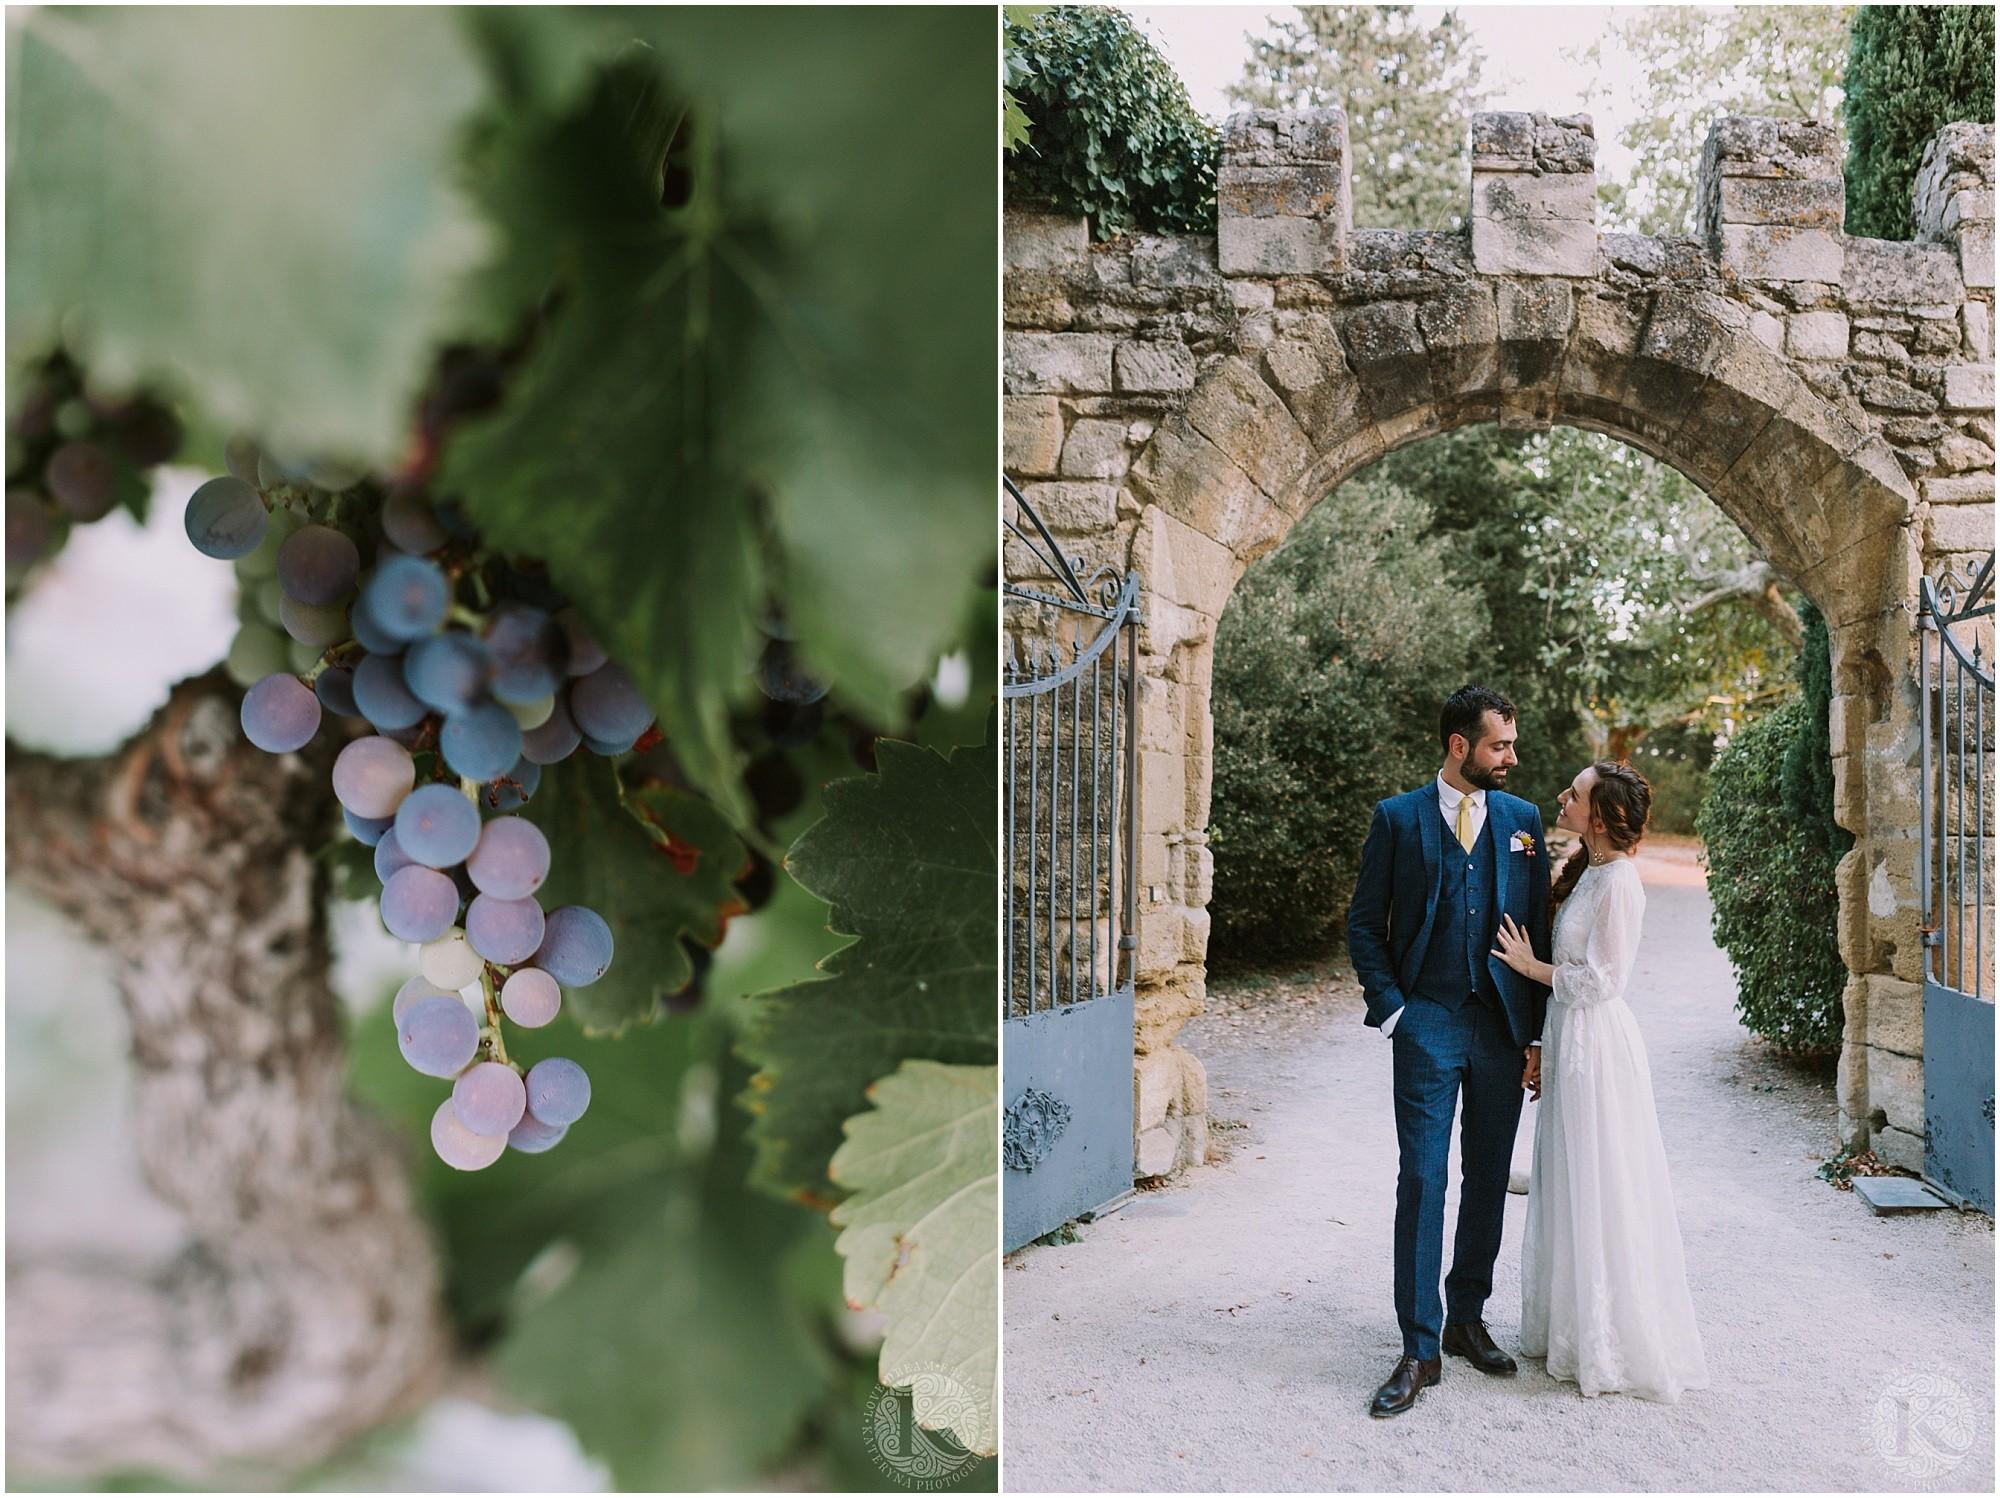 Kateryna-photos-photographe-mariage-vaucluse-provence-avignon-ferme-st-hugues_0080.jpg